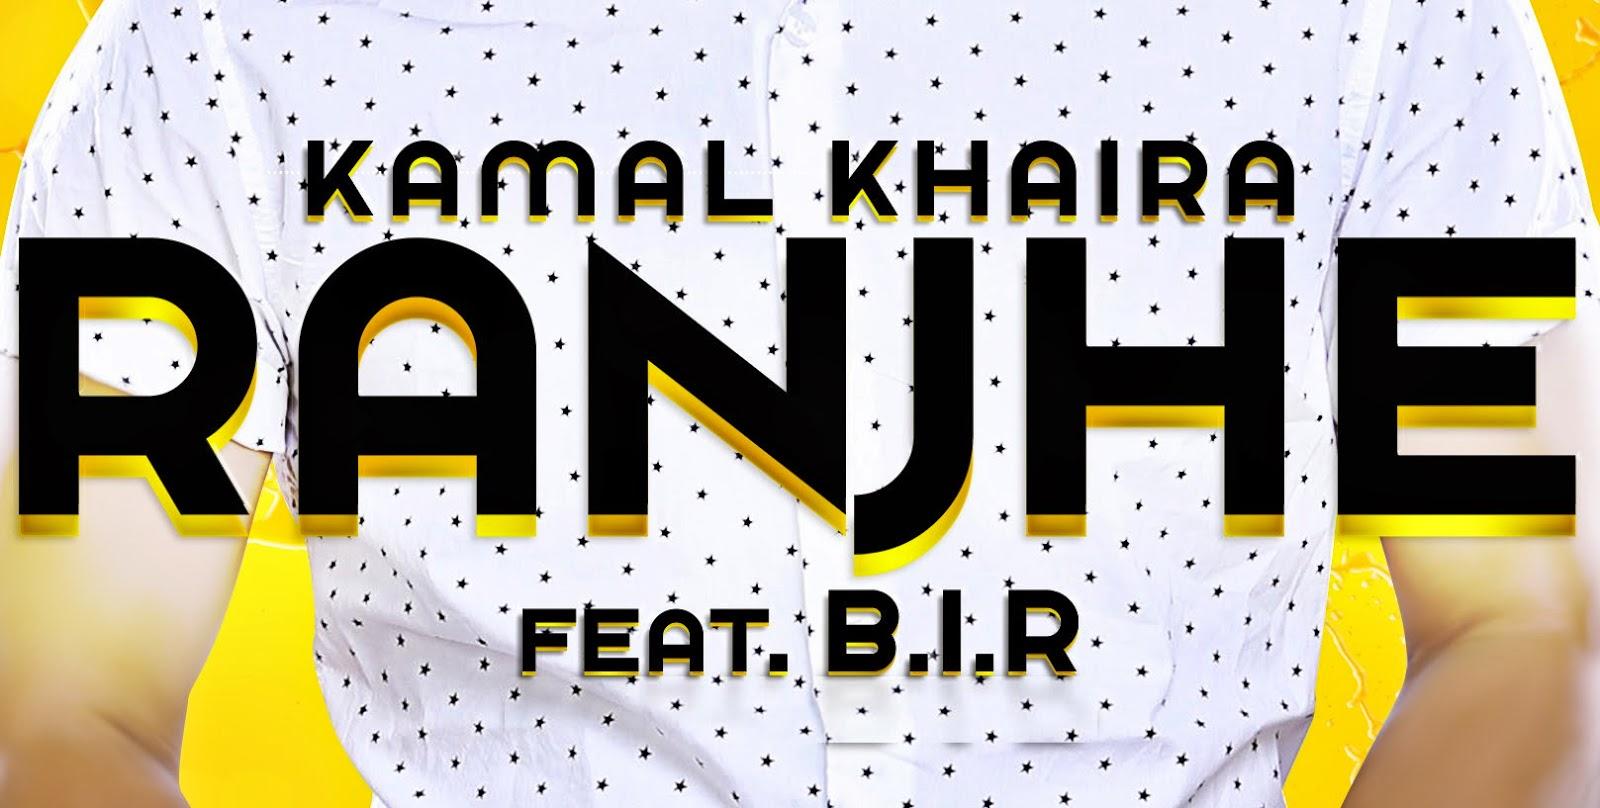 RANJHE SONG LYRICS & VIDEO | KAMAL KHAIRA FEAT B.I.R | PANJ-AAB RECORDS | LATEST PUNJABI SONG 2014